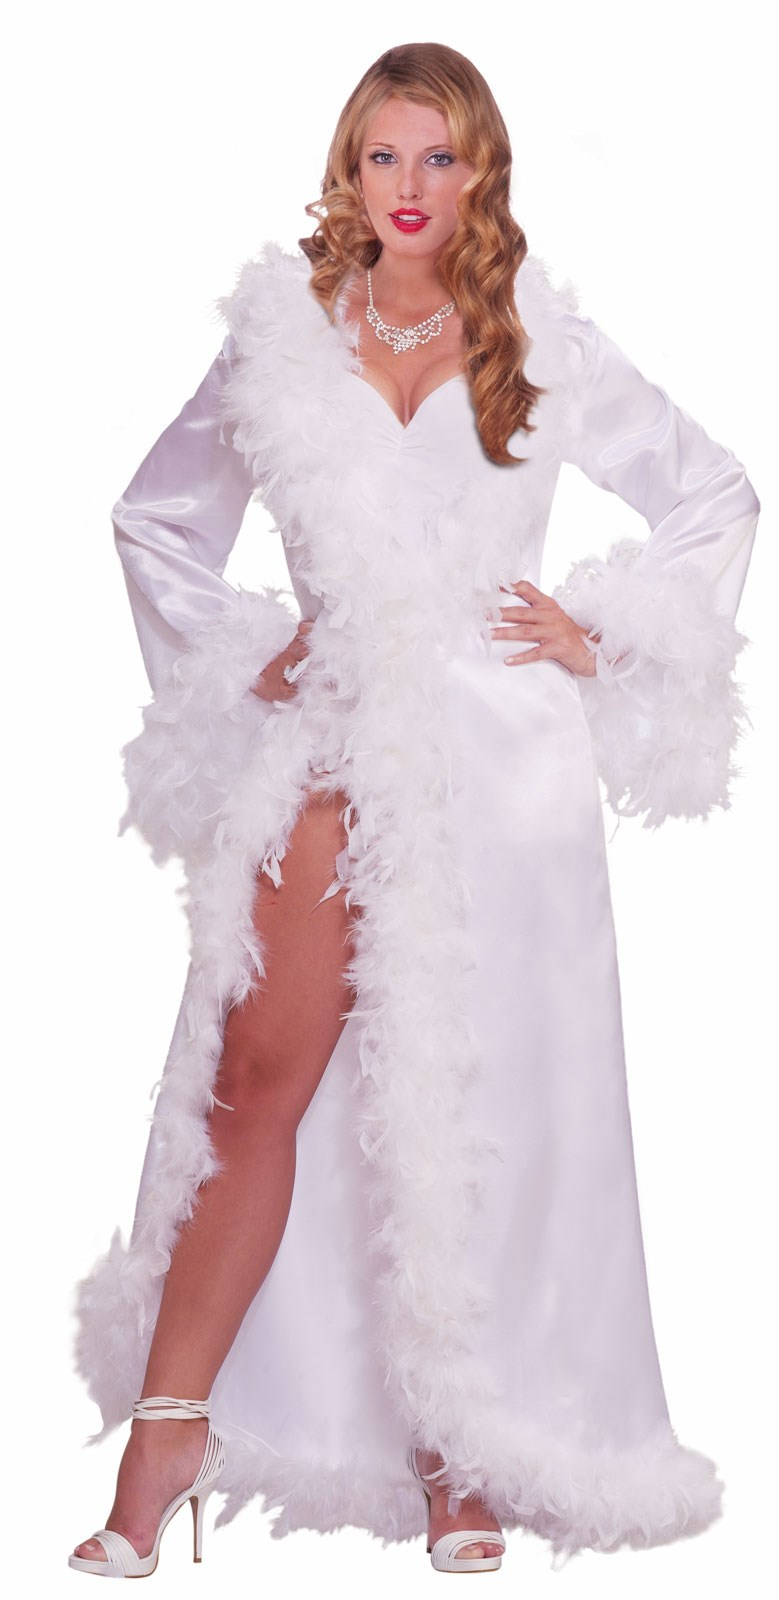 Vintage Hollywood Marabou Satin Robe Adult Costume | BuyCostumes.com